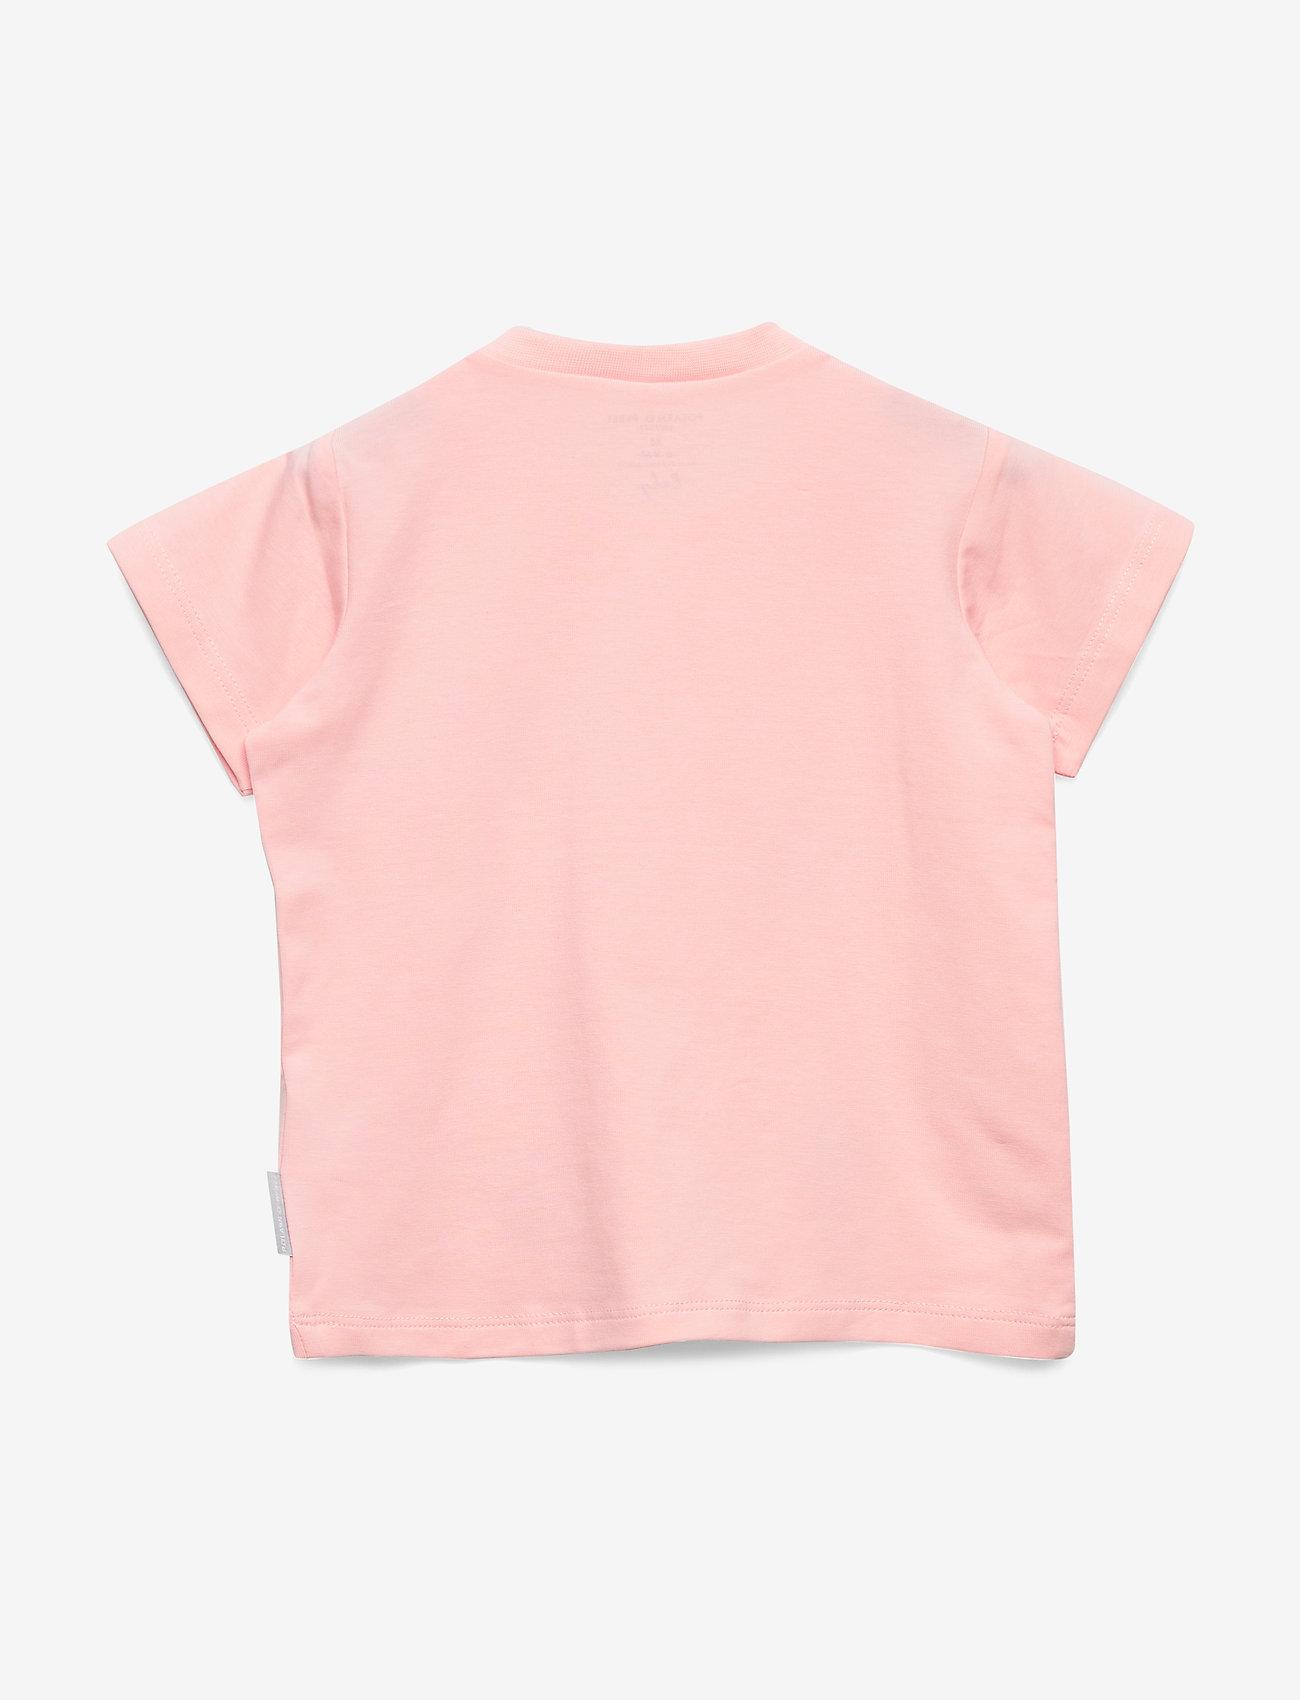 Polarn O. Pyret T-shirt S/s Baby - Överdelar Impatiens Pink